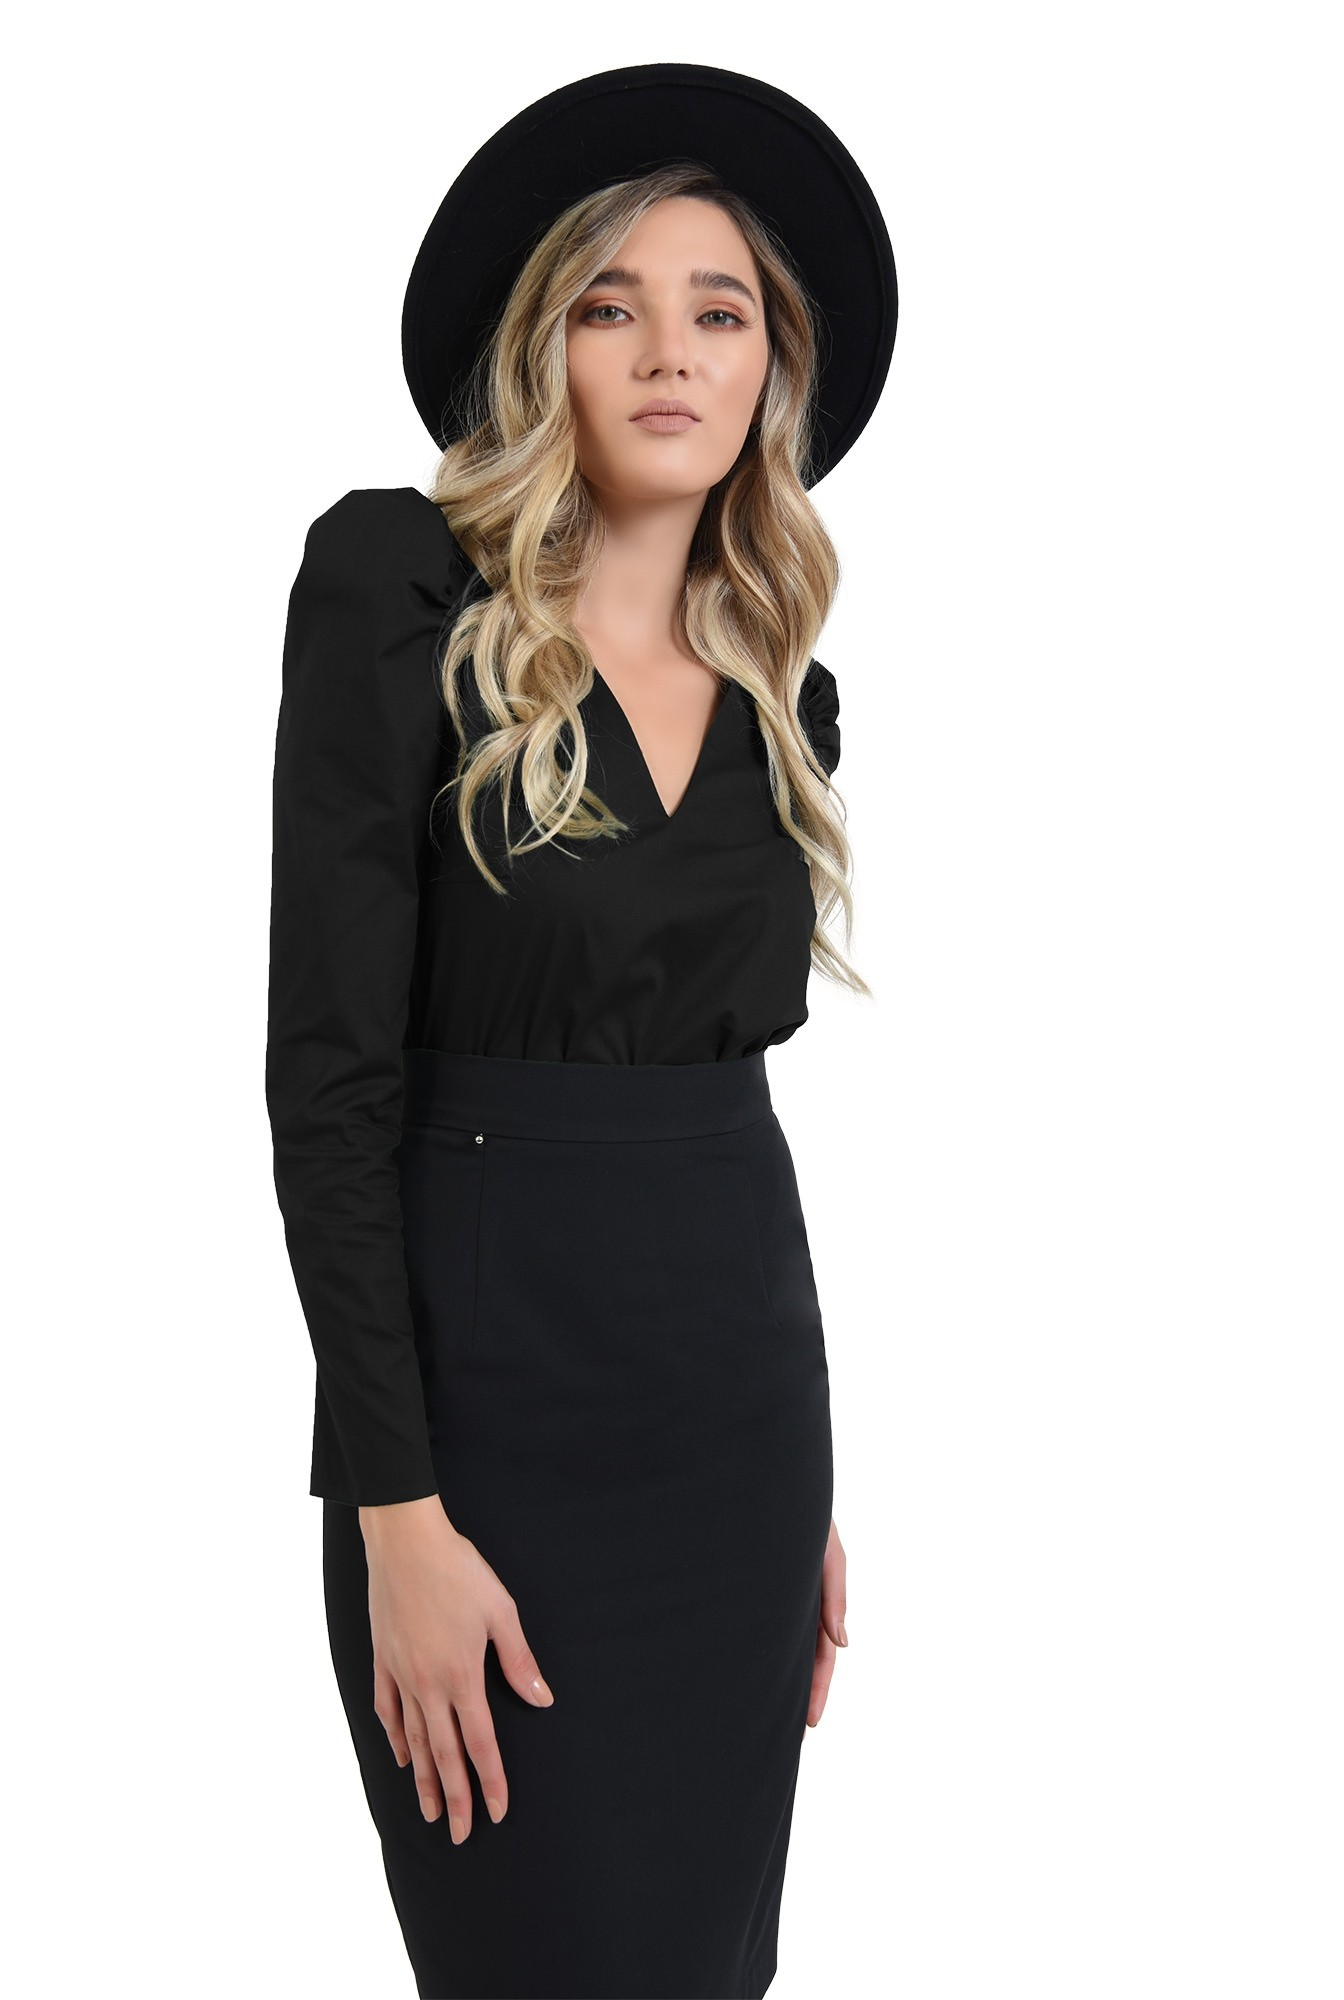 3 - bluza neagra, cu umeri accentuati, cu maneca lunga